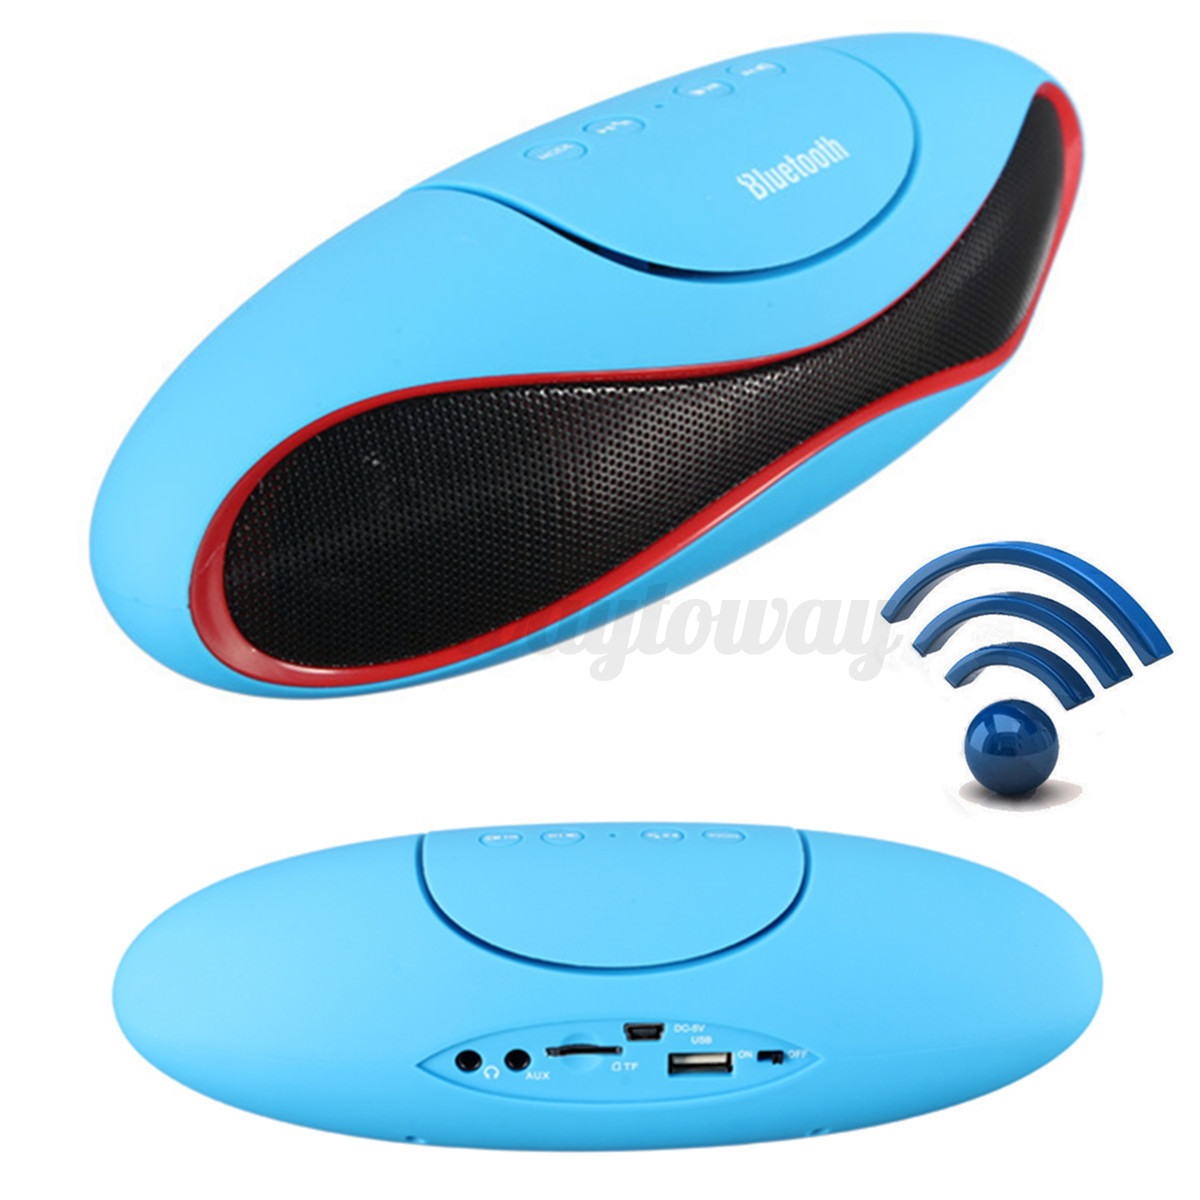 wireless bluetooth lautsprecher fm radio speaker sound box f r handy pc laptop ebay. Black Bedroom Furniture Sets. Home Design Ideas